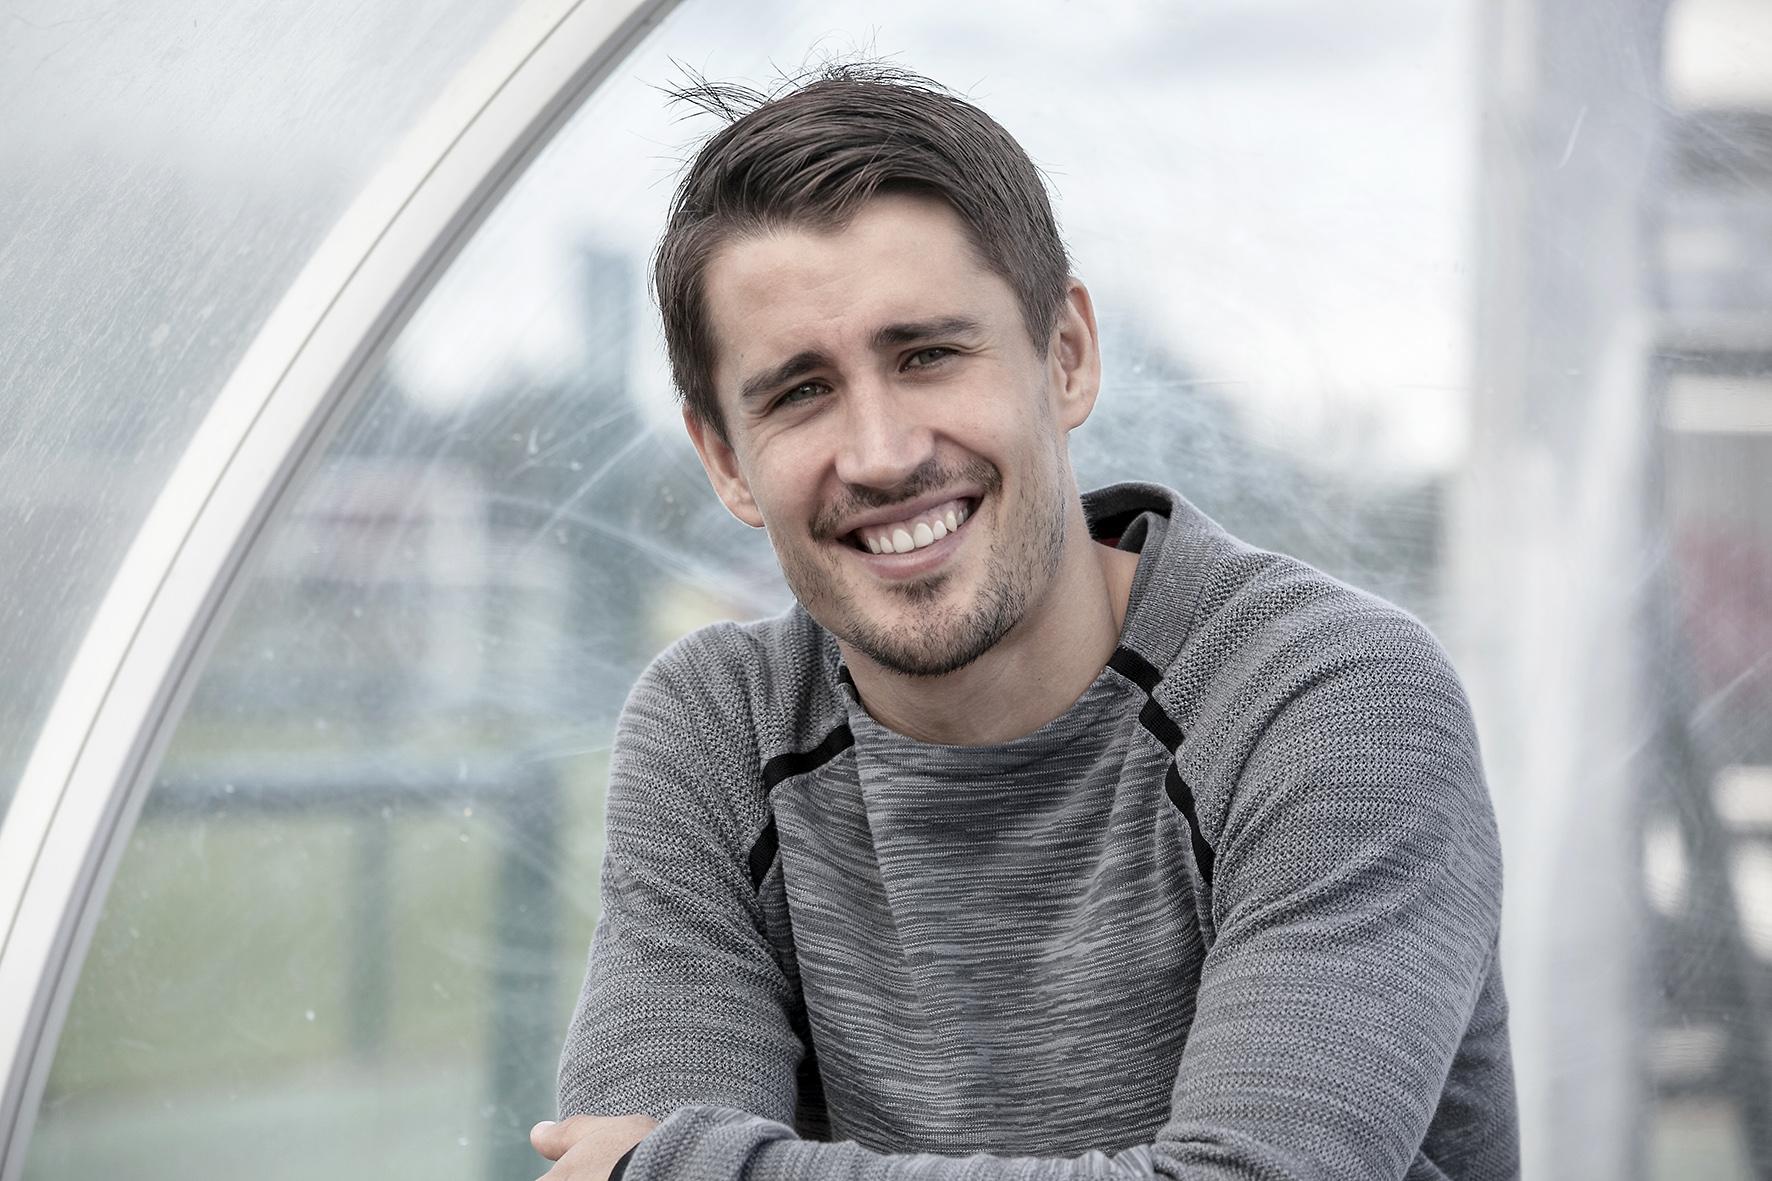 Bojan talks to Guillem Balagué of BBC 5 live about his career